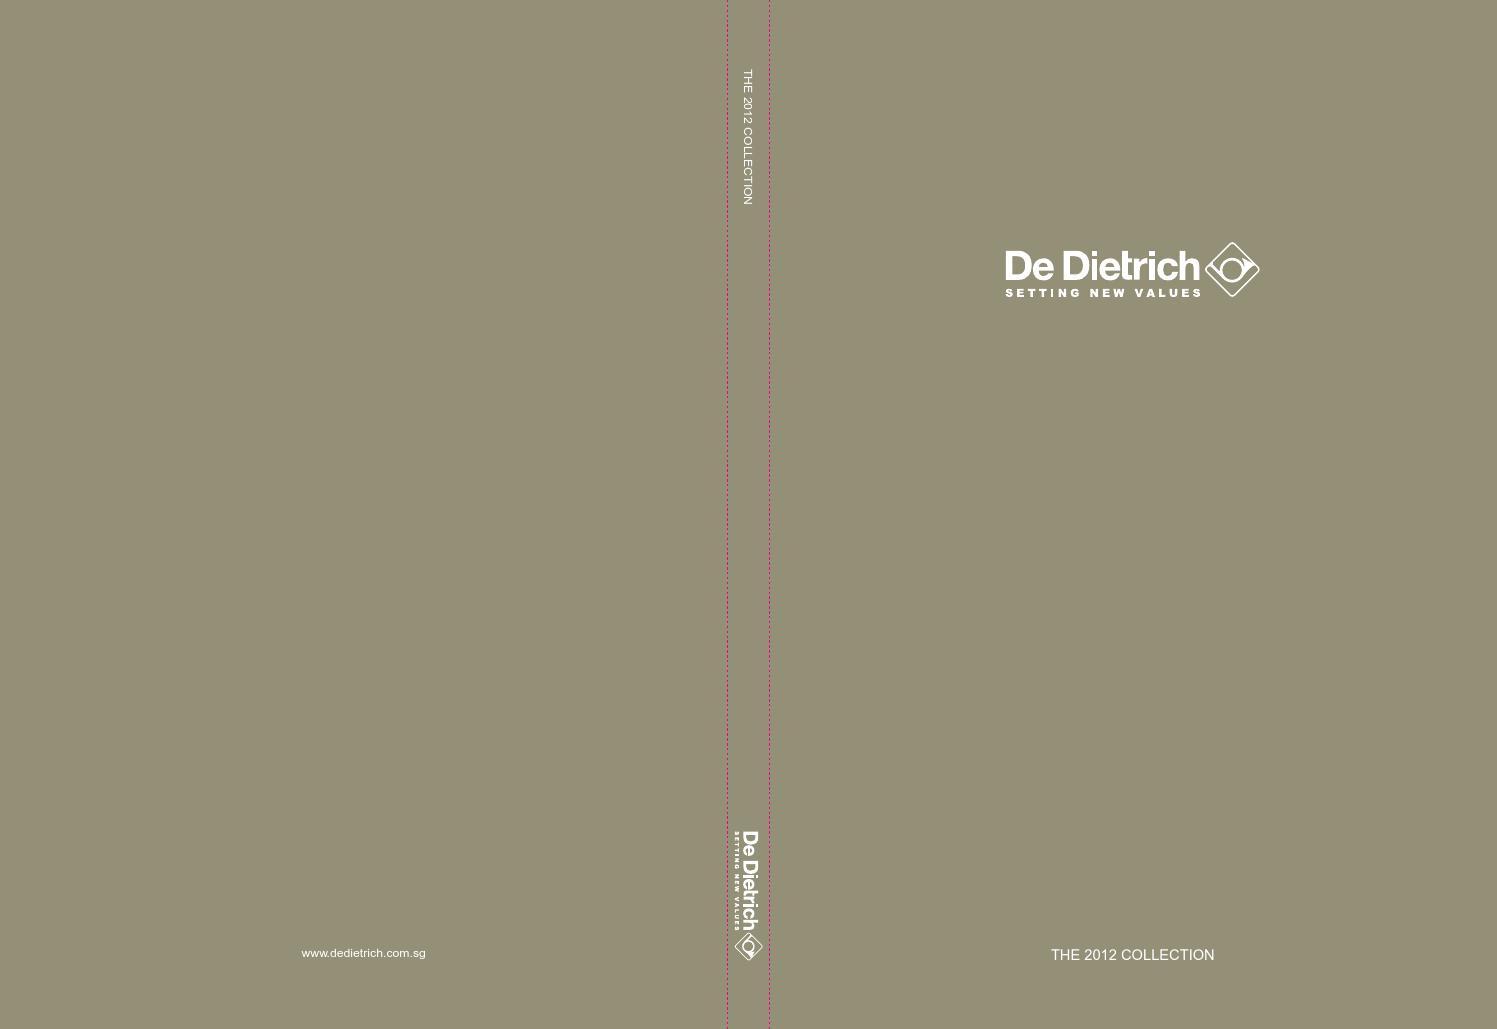 De Dietrich Catalogue 2012 Full Set By Dinhlu Issuu